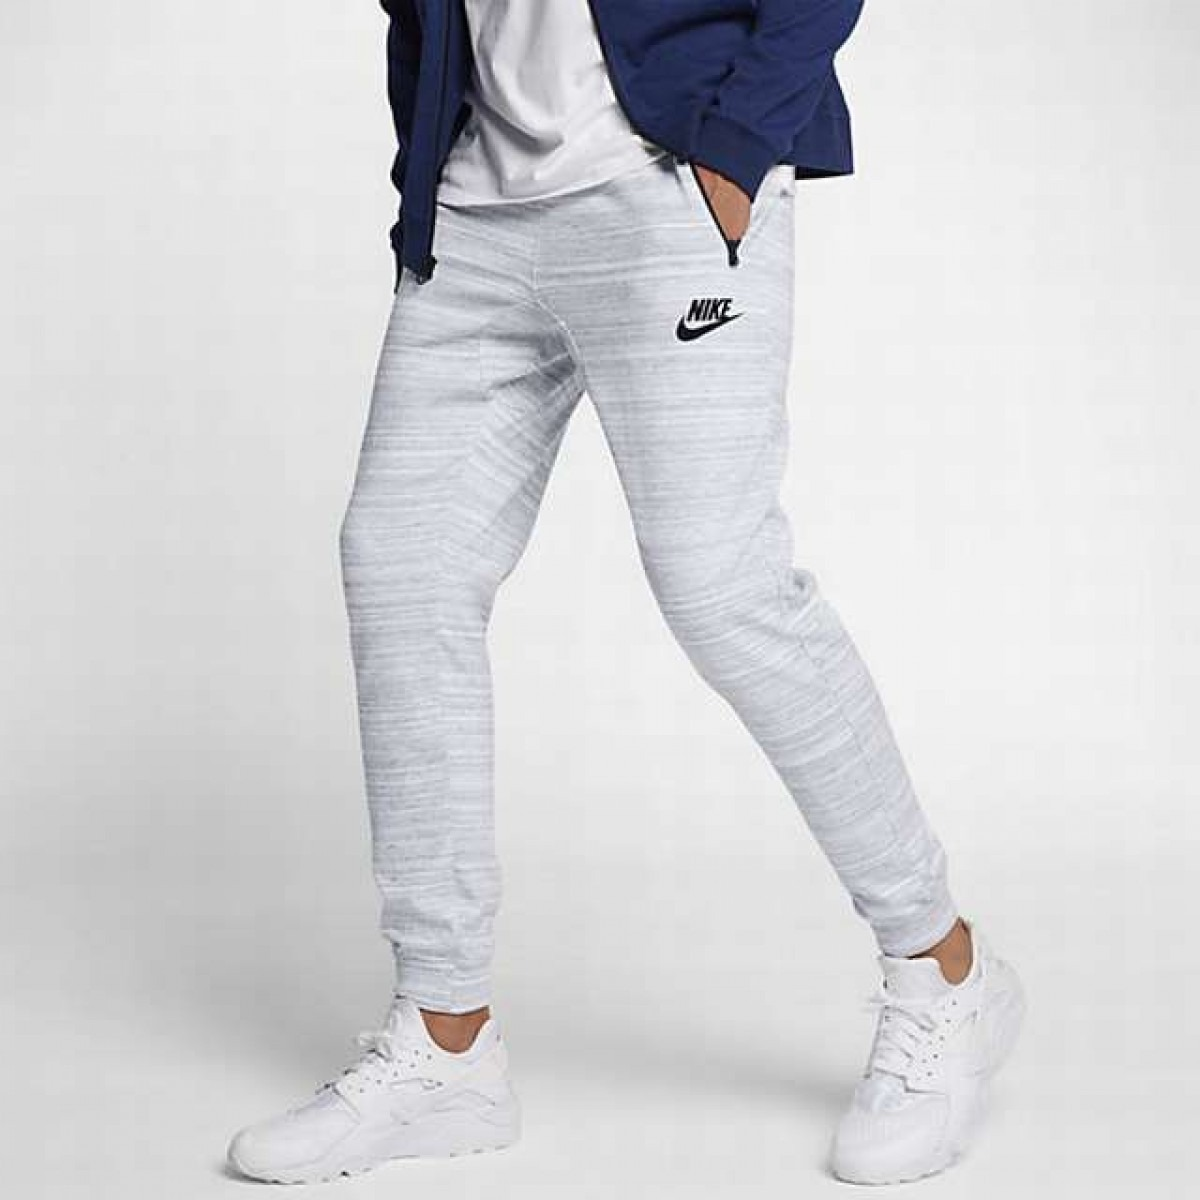 patrón Metro Por el contrario  Pantalon Jogger Nike Hombre - Sudadera - $ 319.997 en Mercado Libre